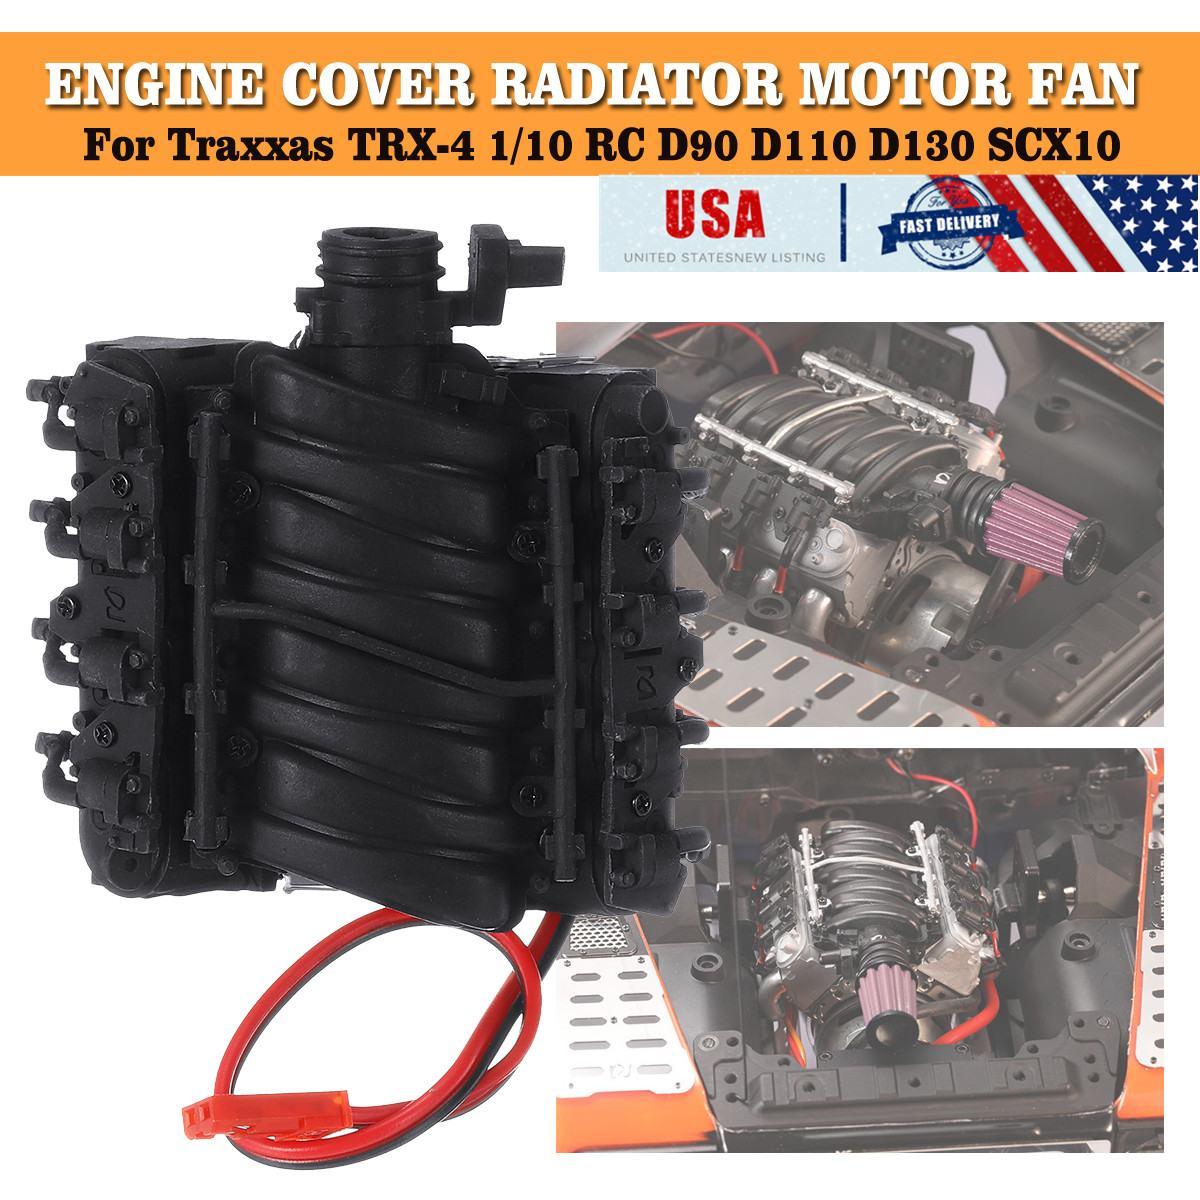 Motor Simulador de radiador GRC Motor ventilador de refrigeración Dual para Traxxas TRX-4 1/10 RC D90 D110 D130 SCX10 Motor de simulación Corvette